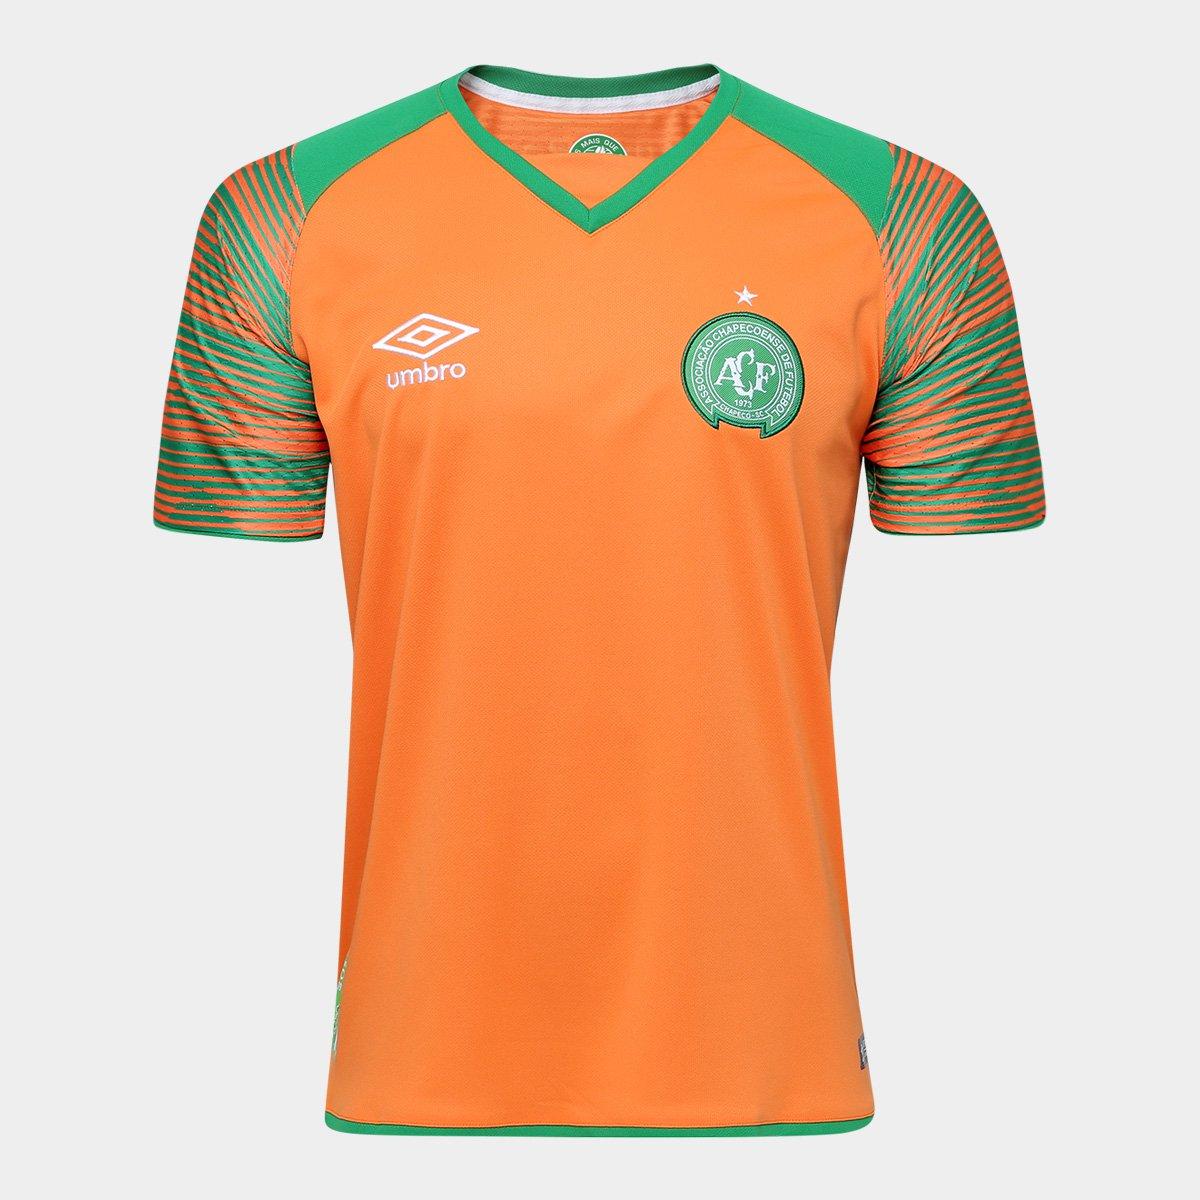 551c3476af00b Camisa Chapecoense Goleiro 17 18 nº 1 Torcedor Umbro Masculina - Laranja e  Verde - Compre Agora